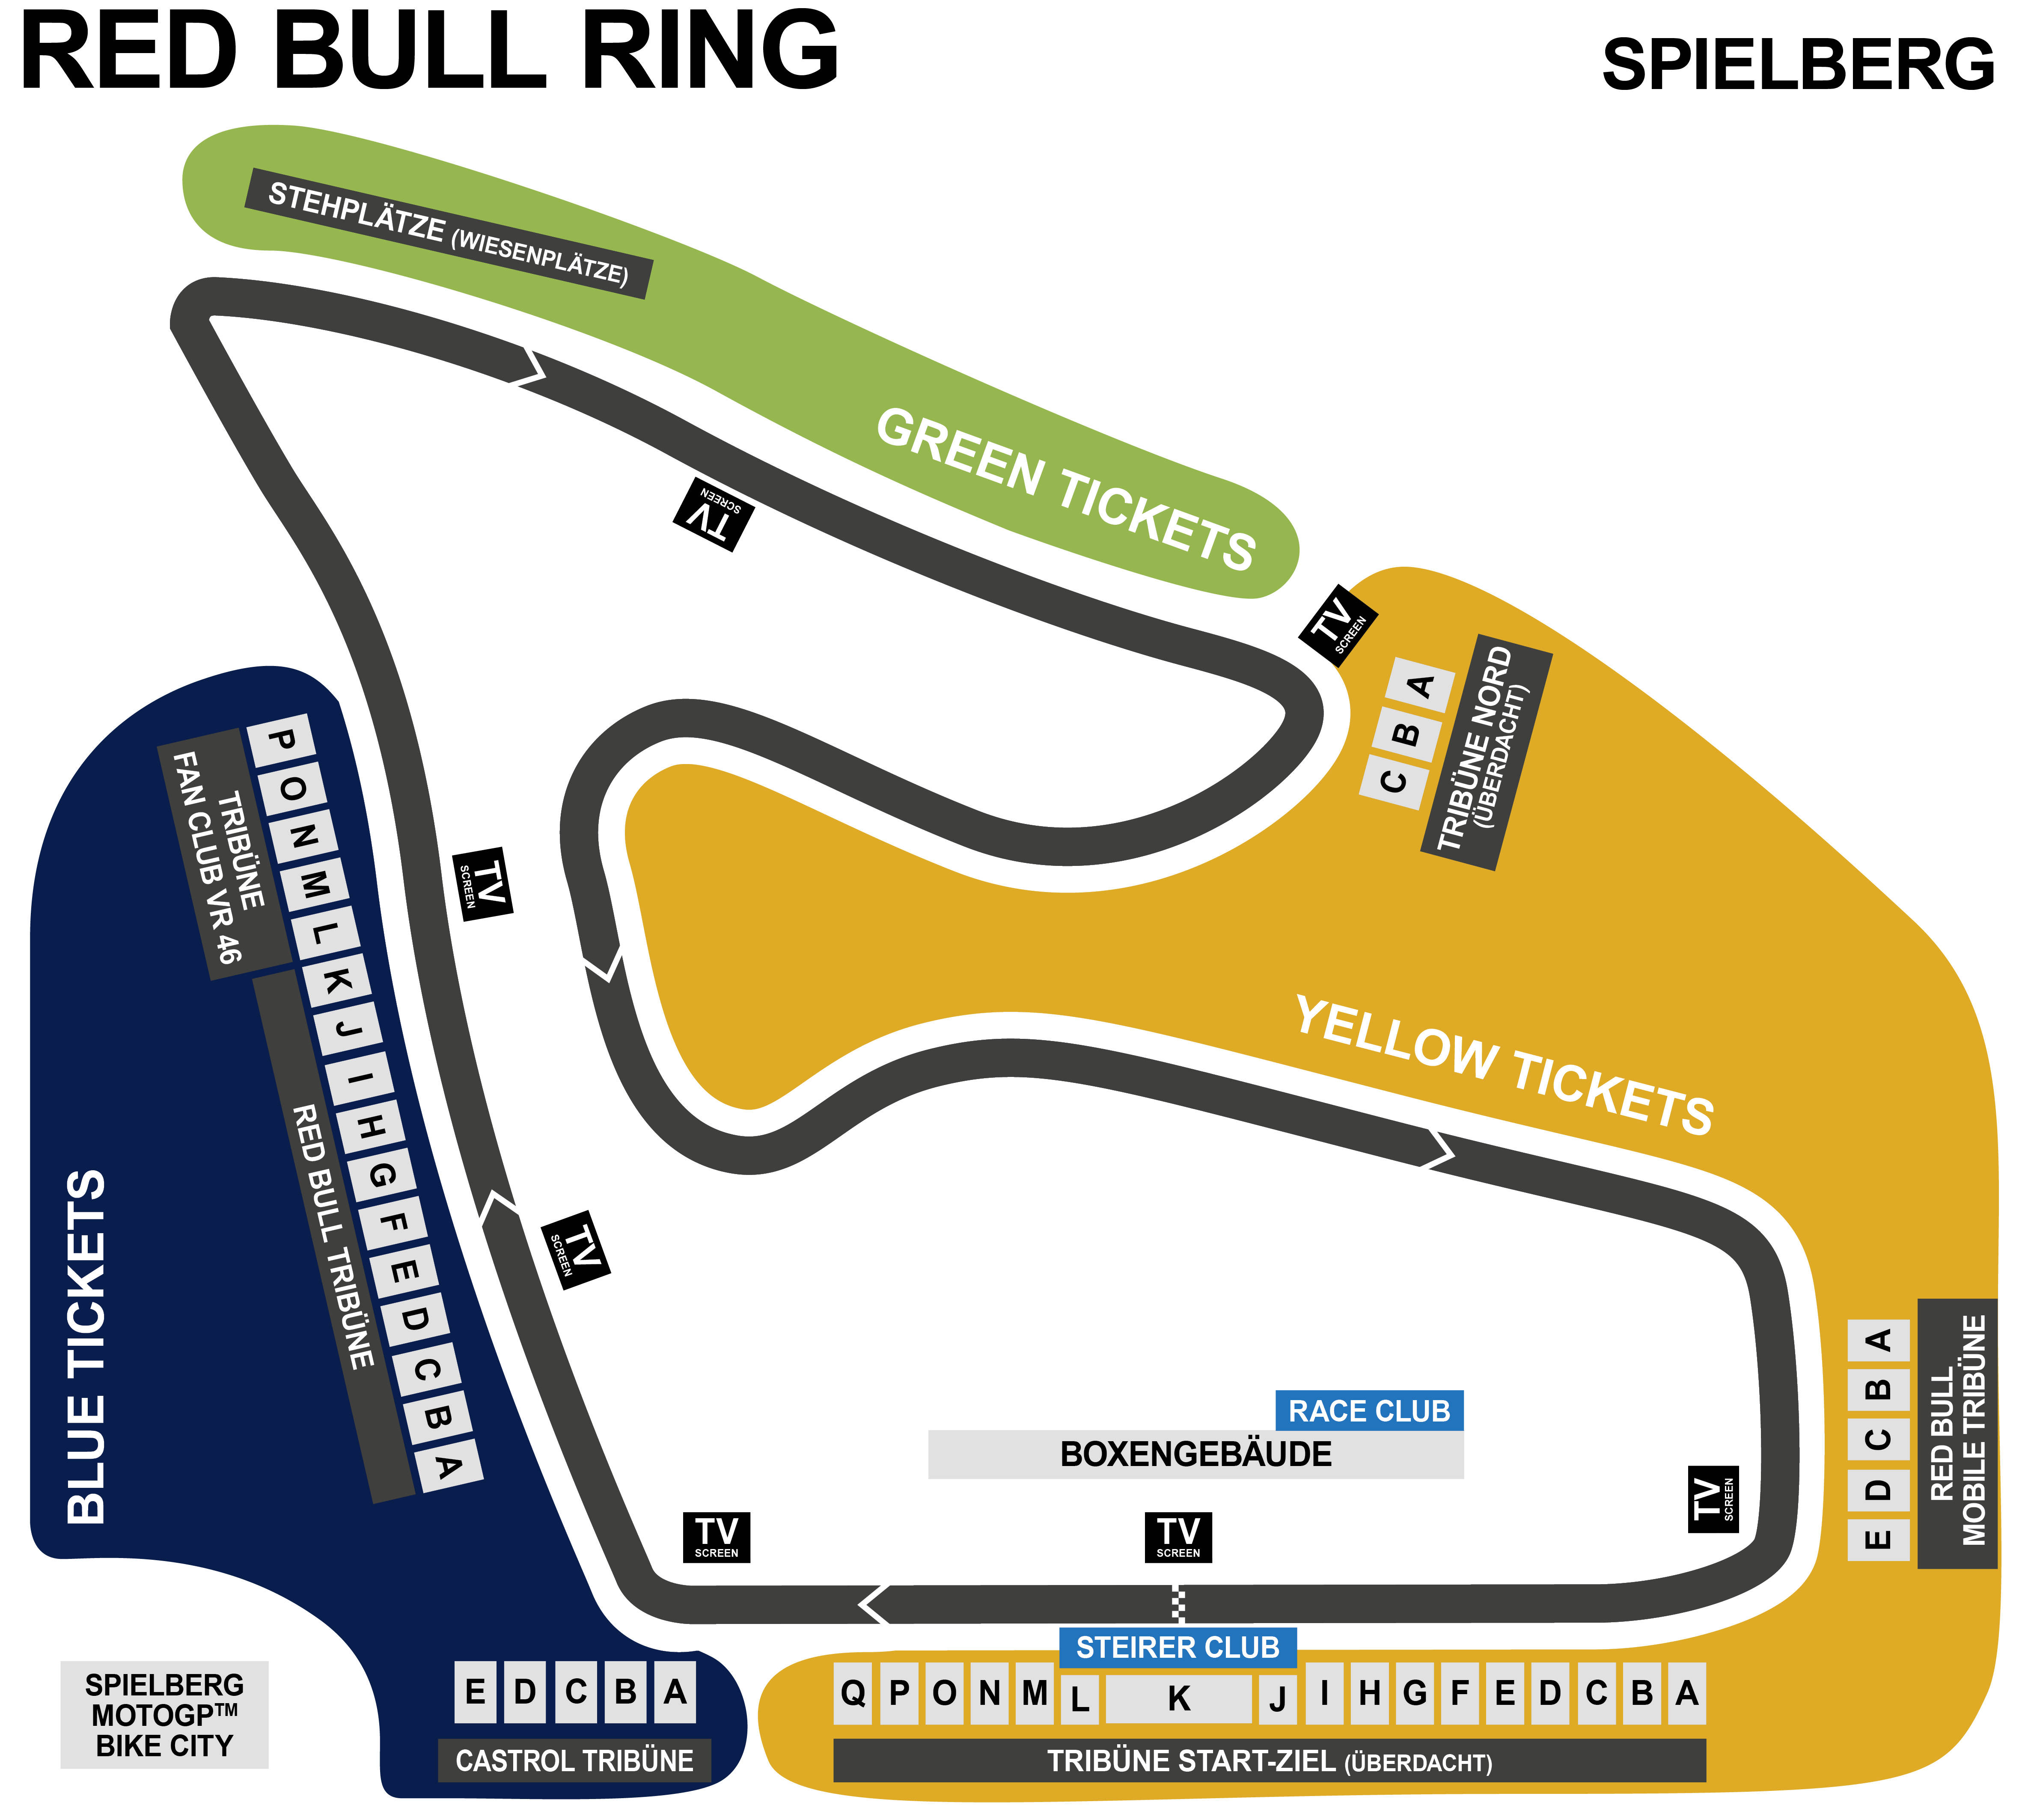 MotoGP Spielberg - Red Bull Ring, Spielberg = ticket.krone.at